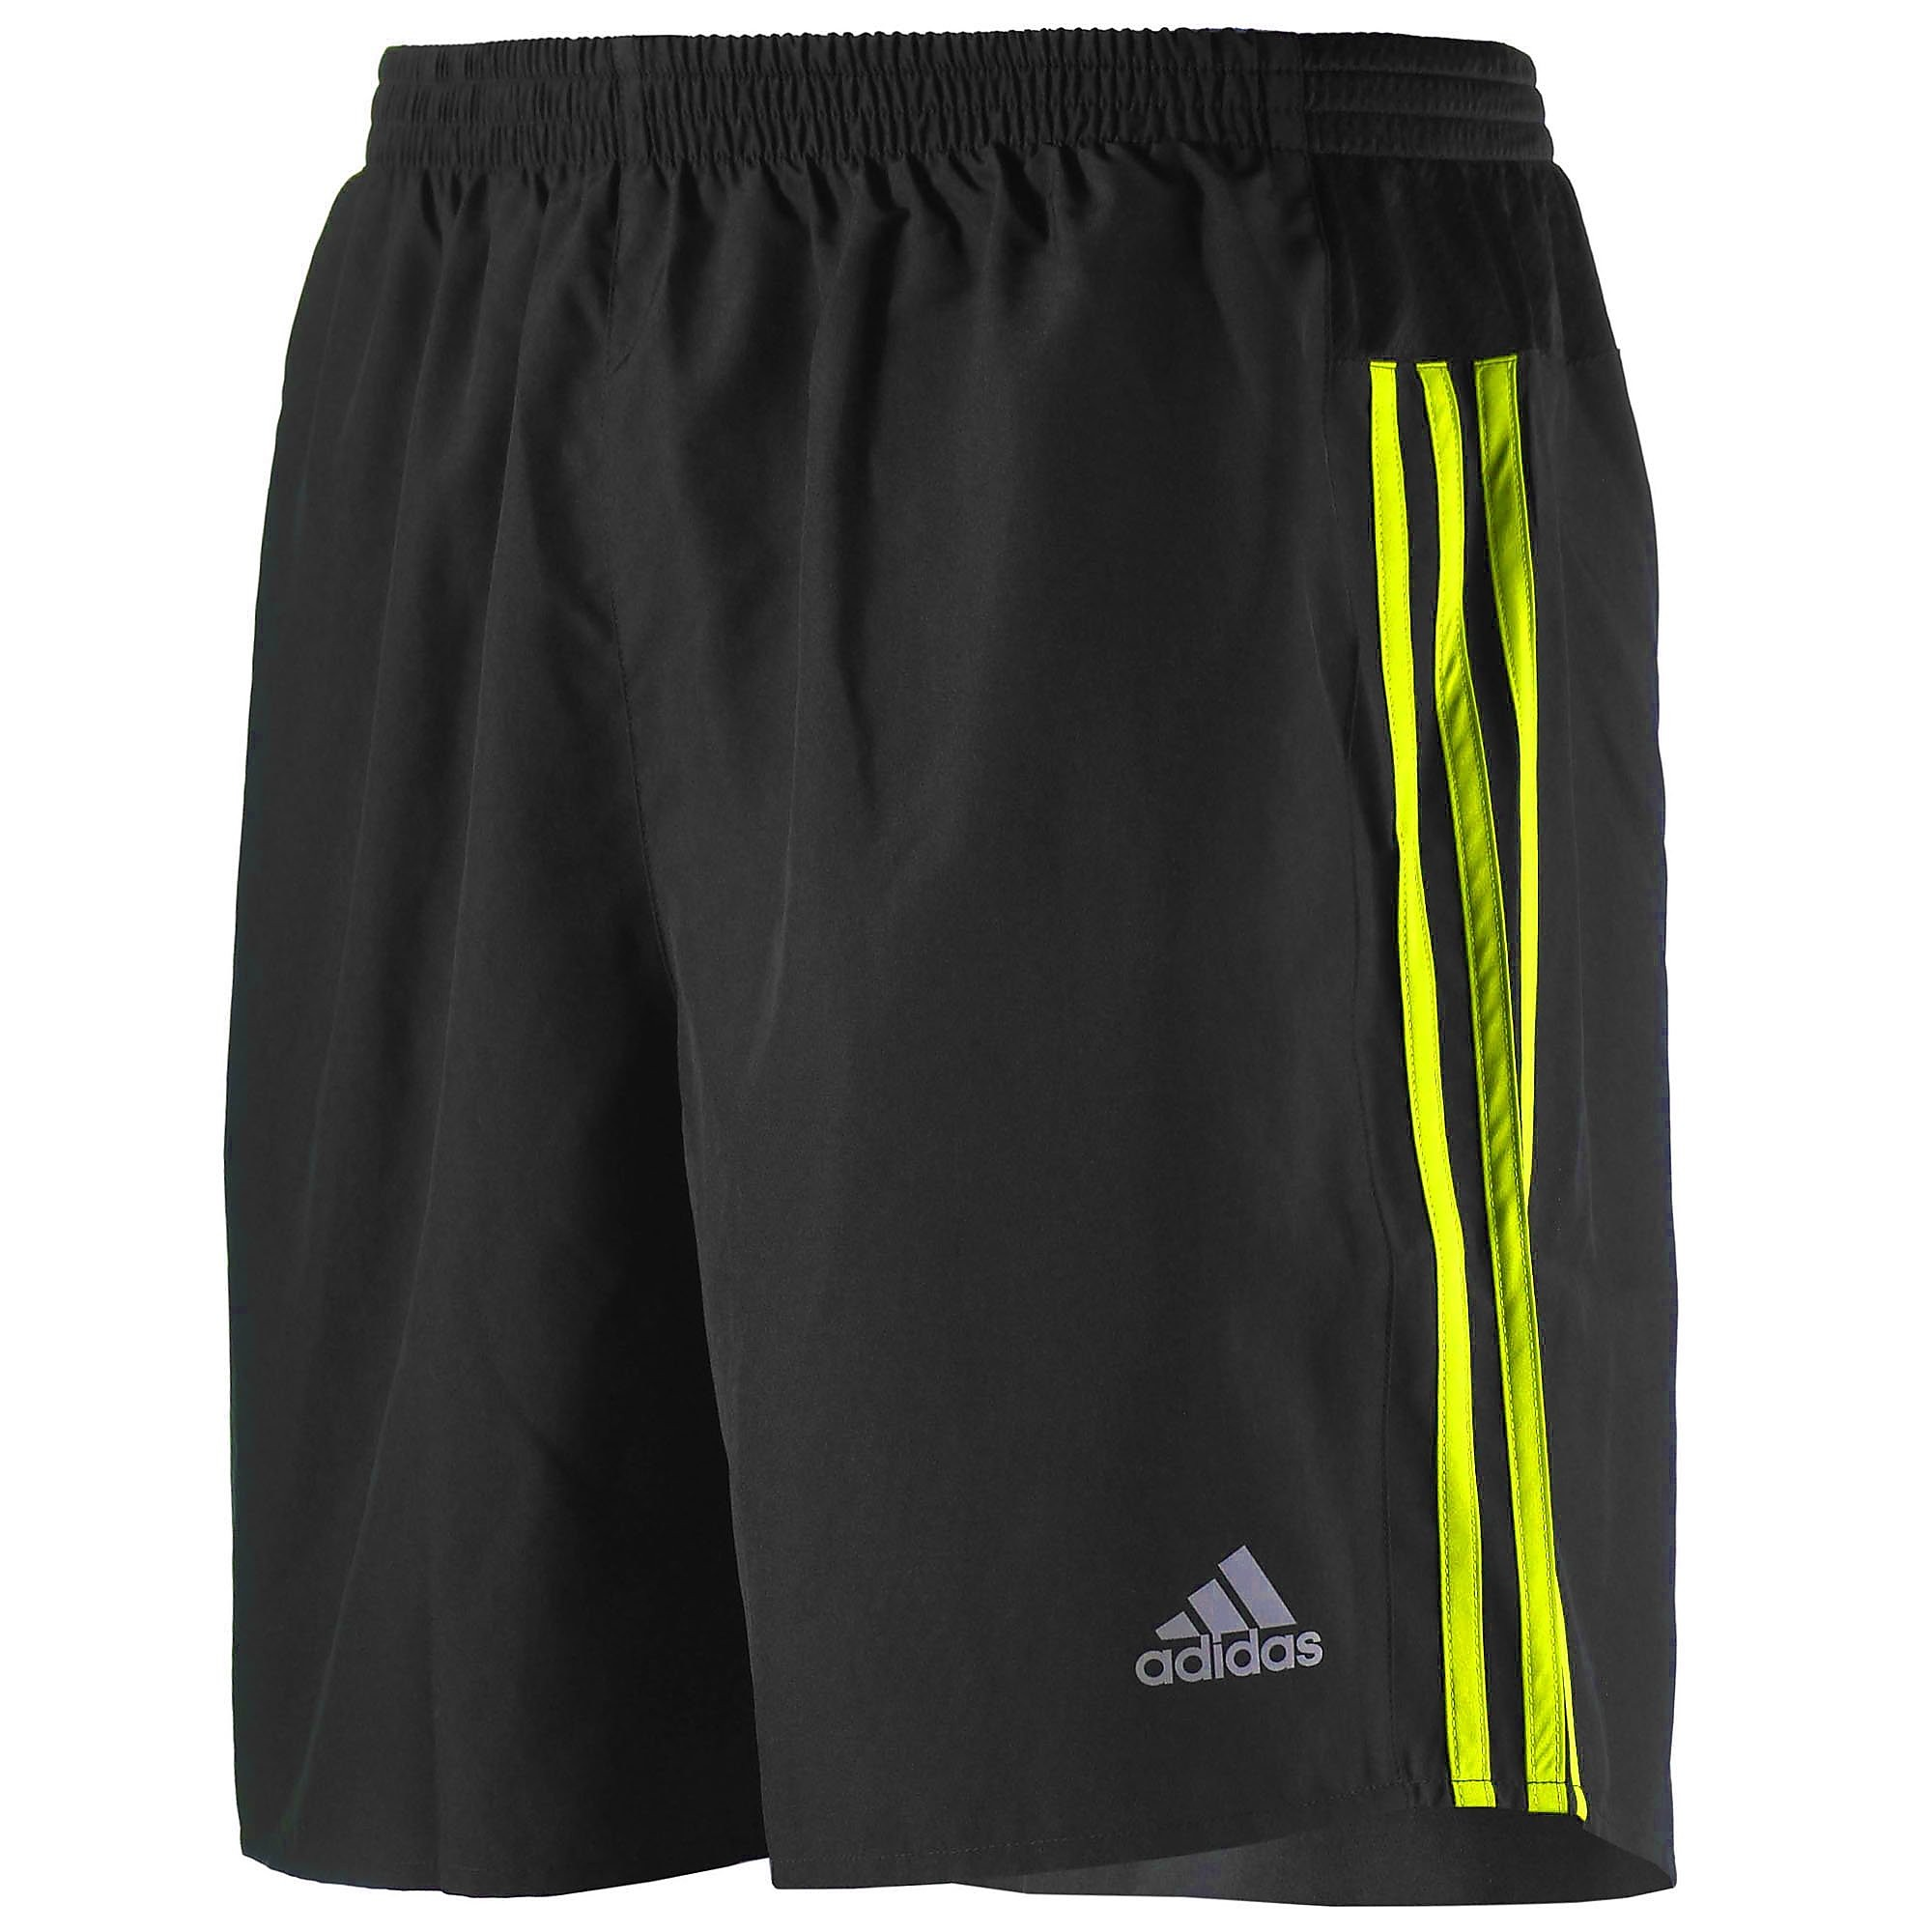 adidas rs 7 inch short